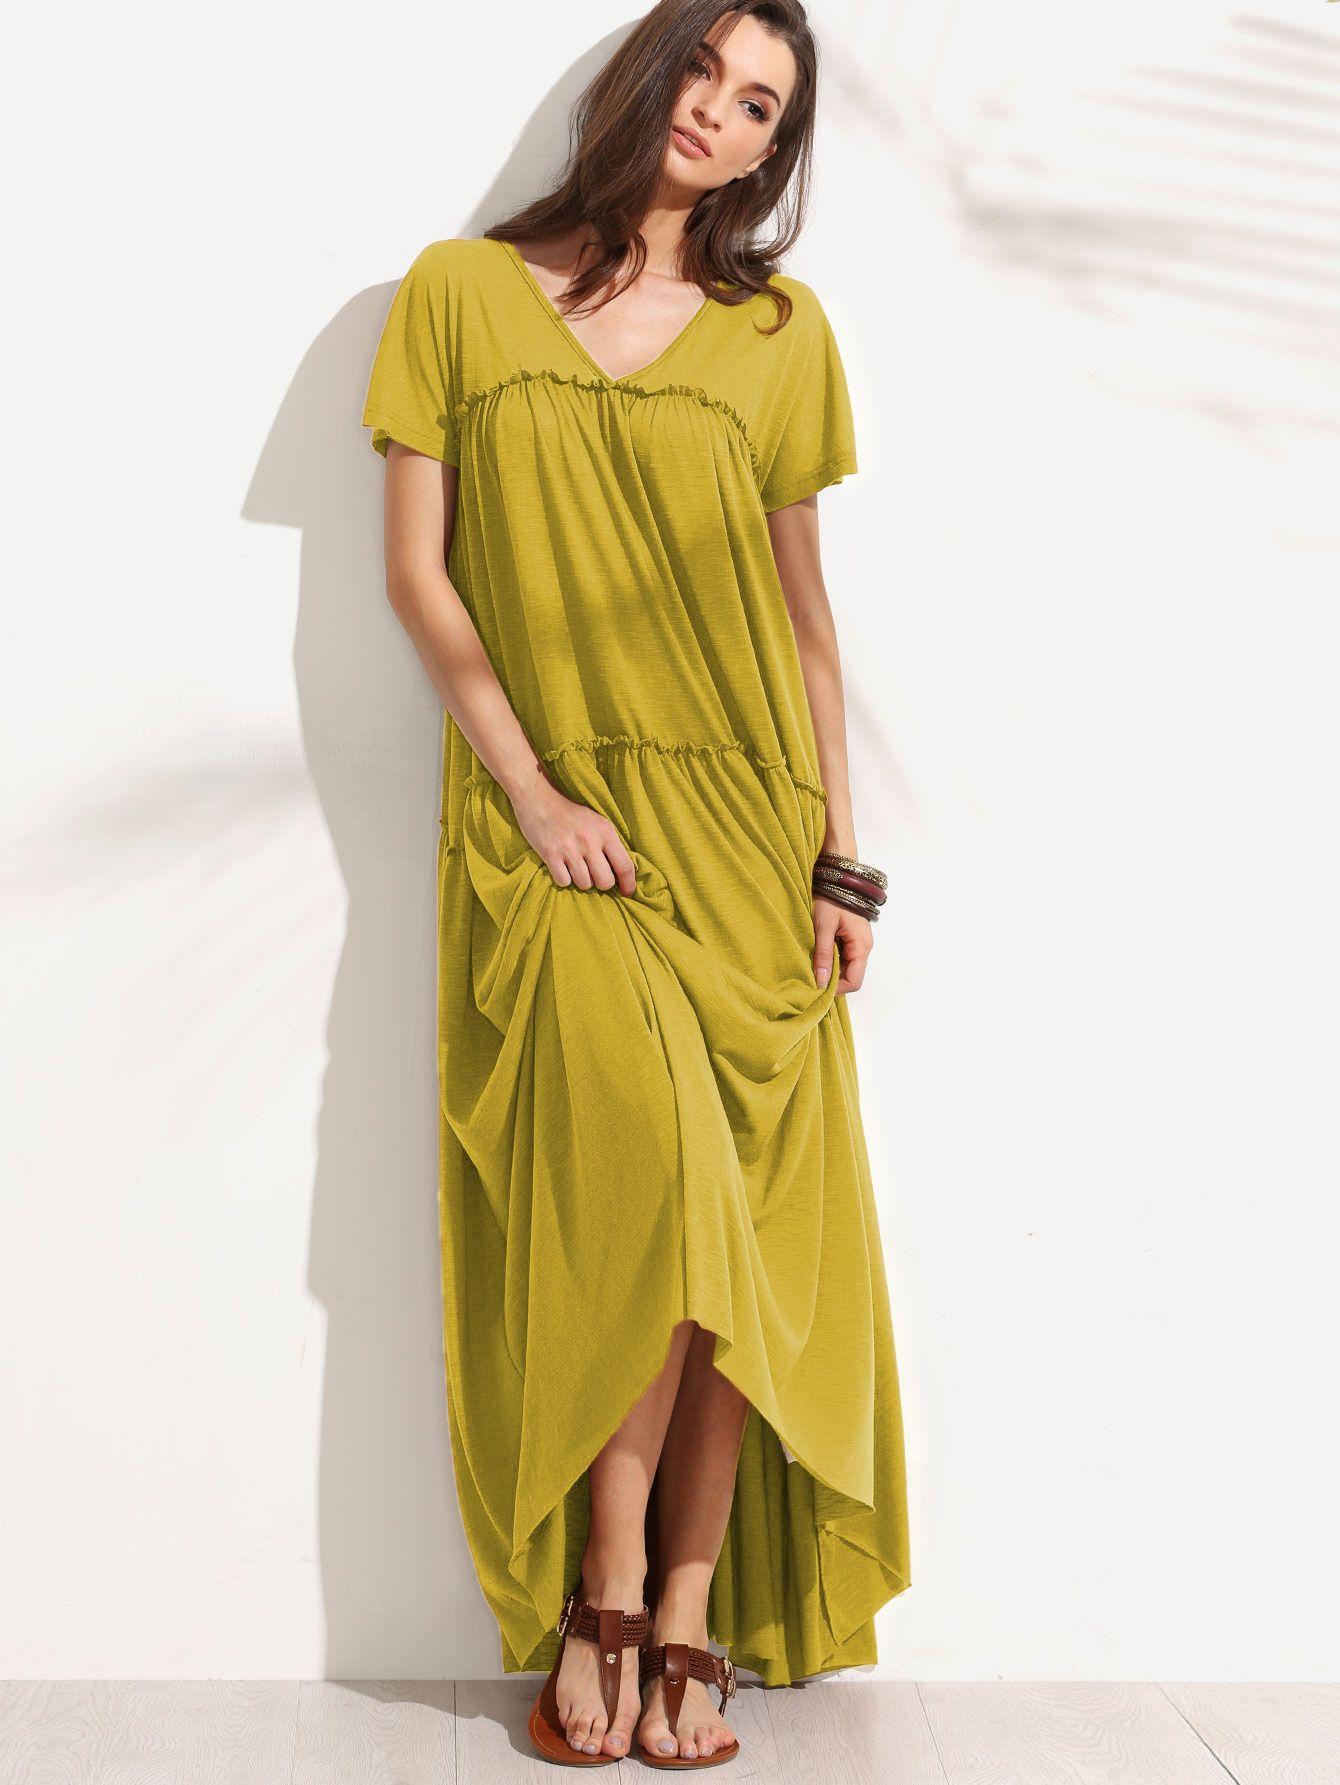 062637d6c57b Mustard Double V Neck Frilled Tent Dress Vestiti Per Le Donne